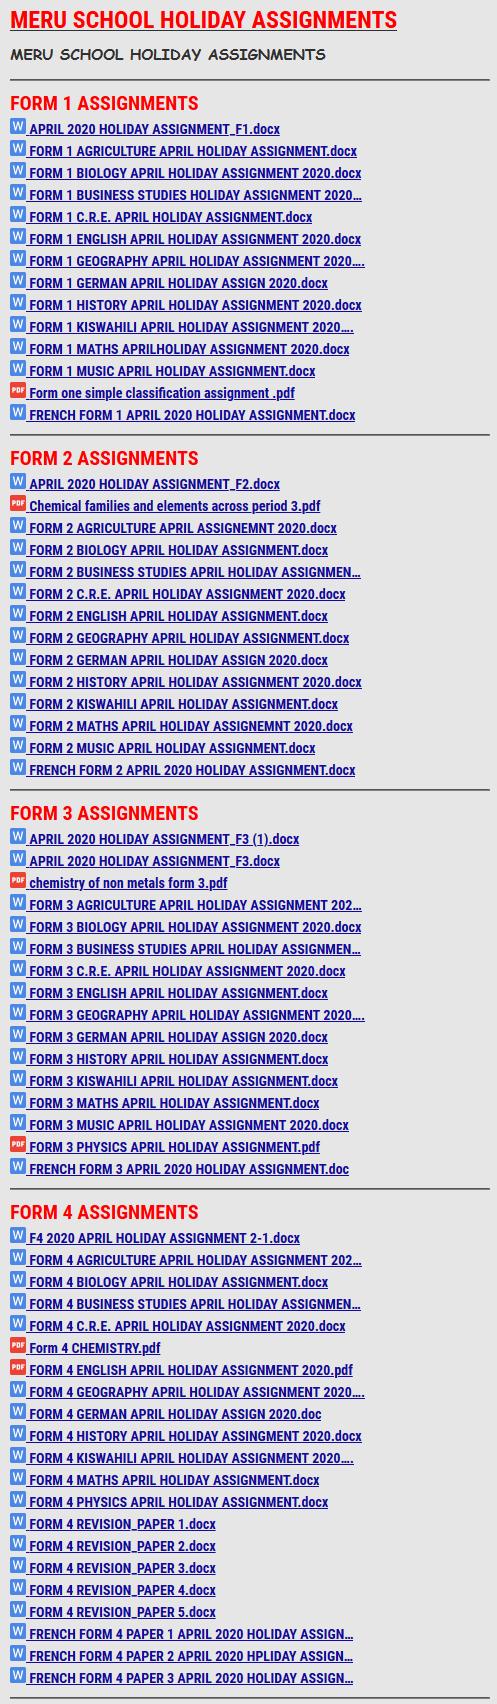 MERU SCHOOL HOLIDAY ASSIGNMENTS